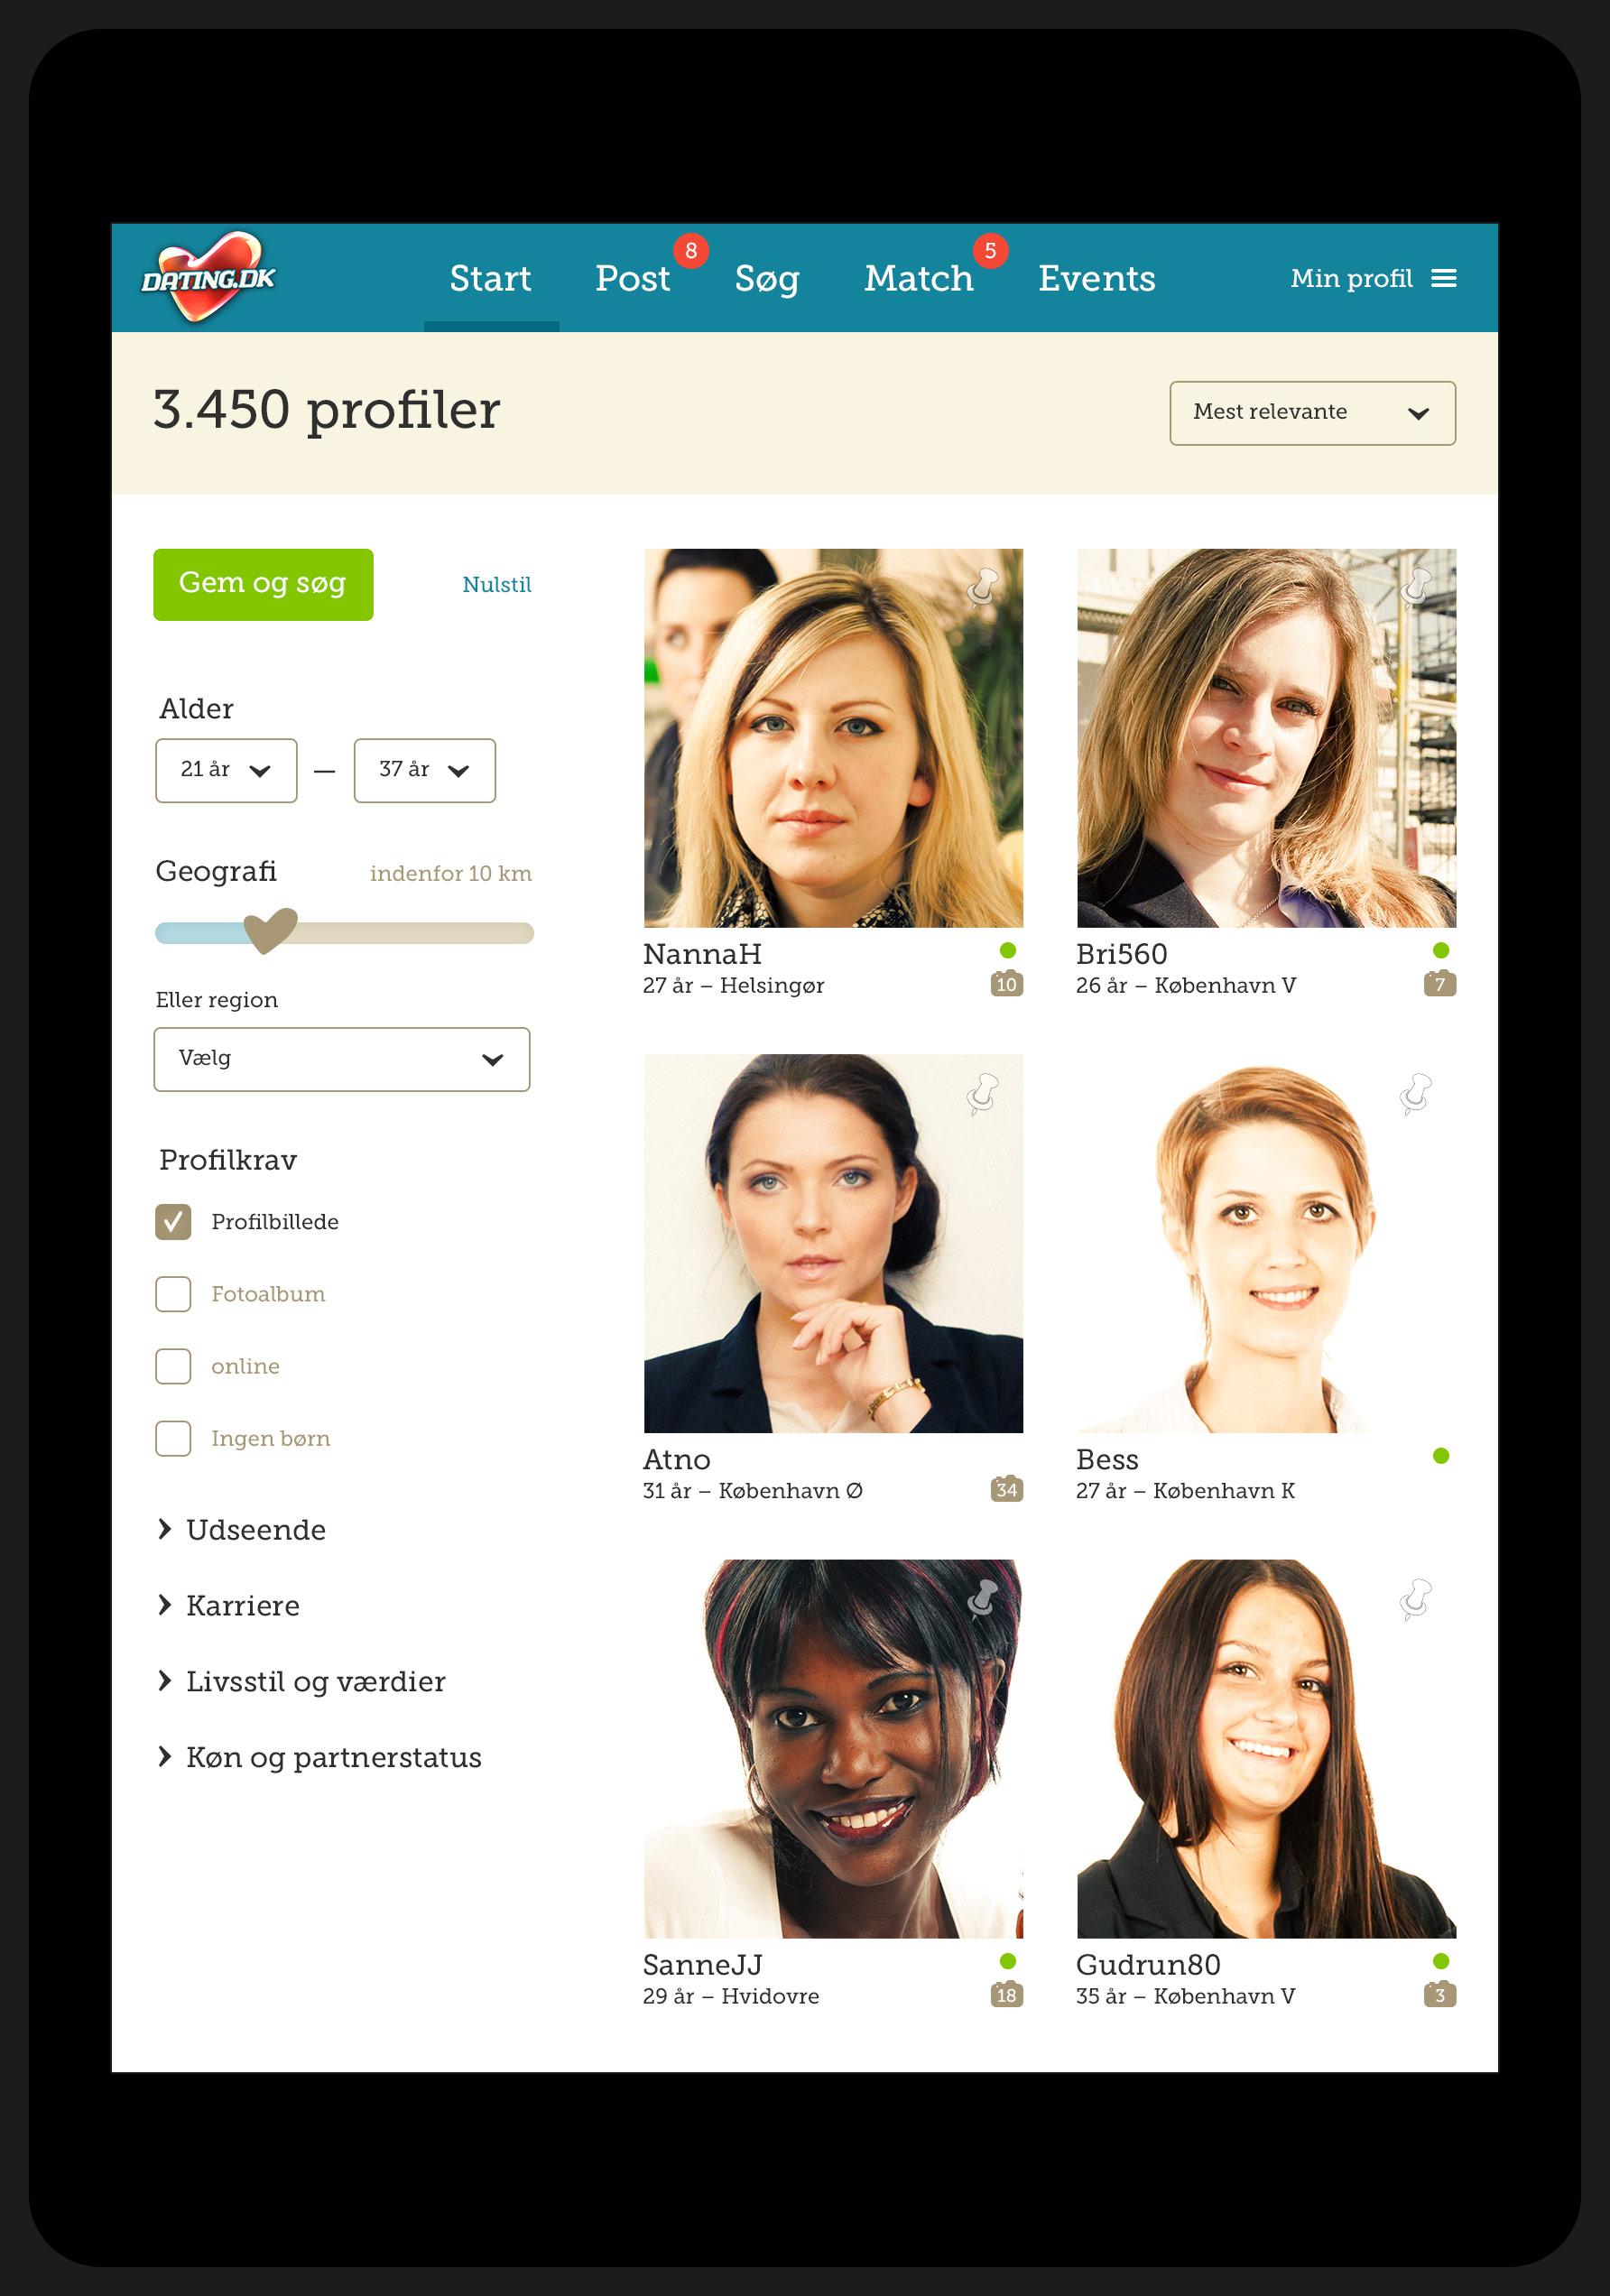 Kontakt dating.dk sonar dating app